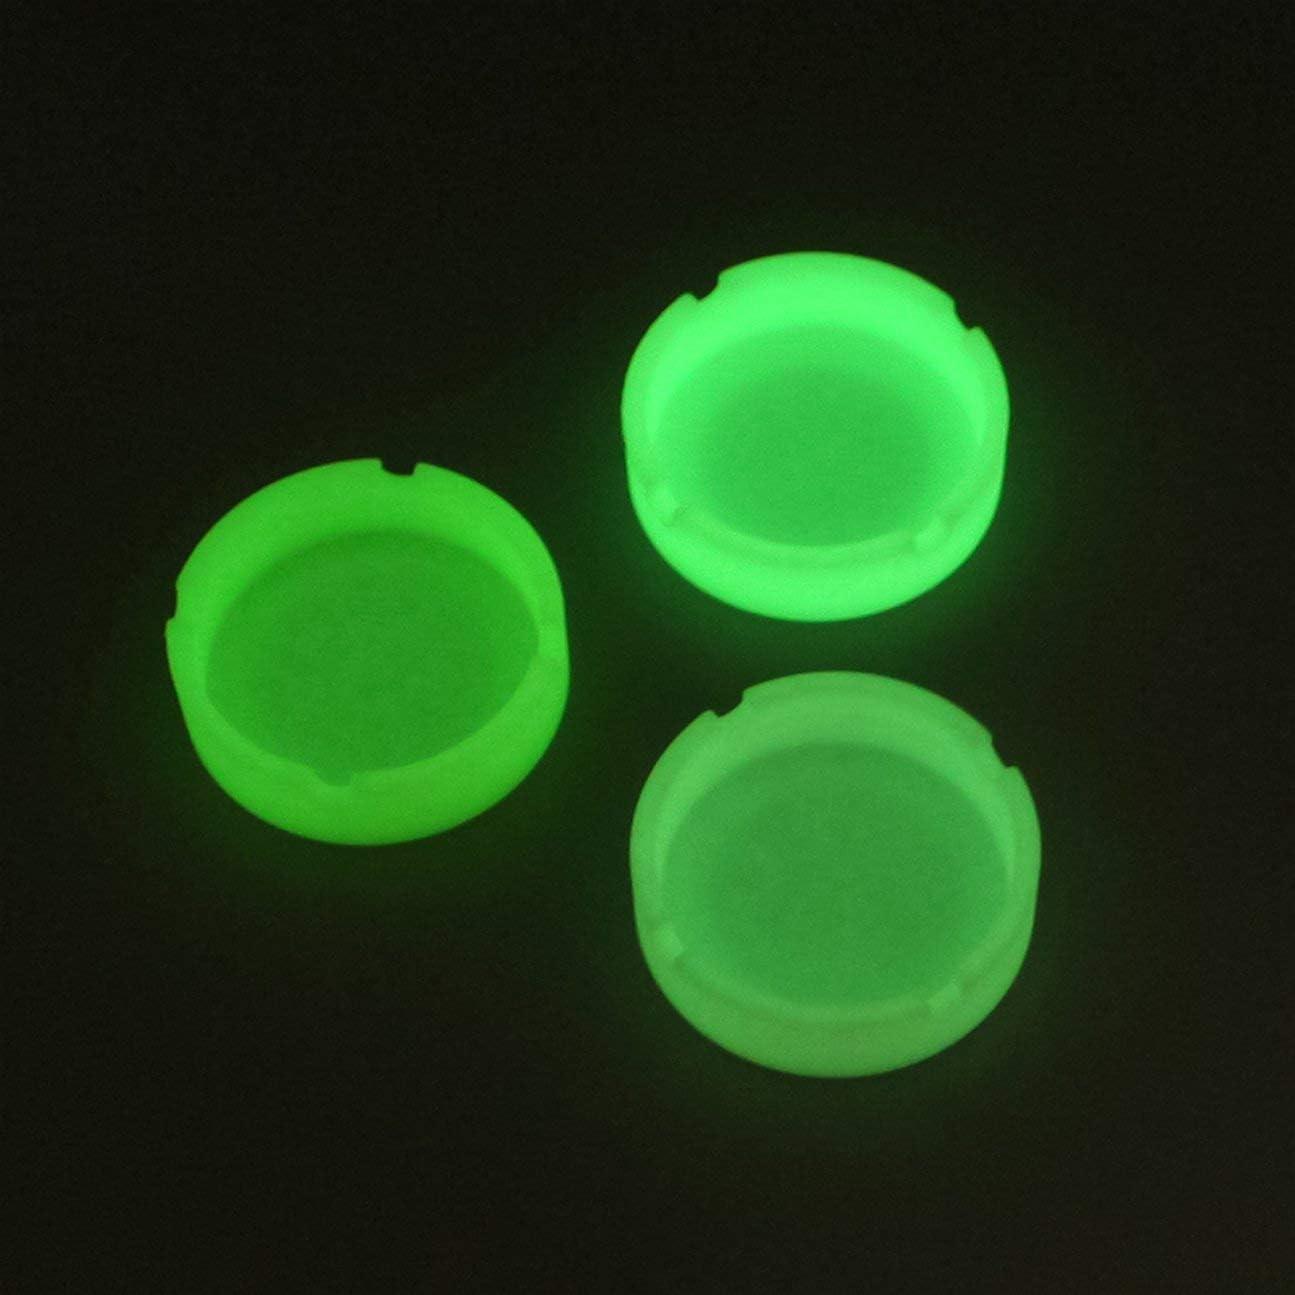 HIPENGYANBAIHU Cendrier Portable en Silicone Cendrier Fluorescent Lumineux